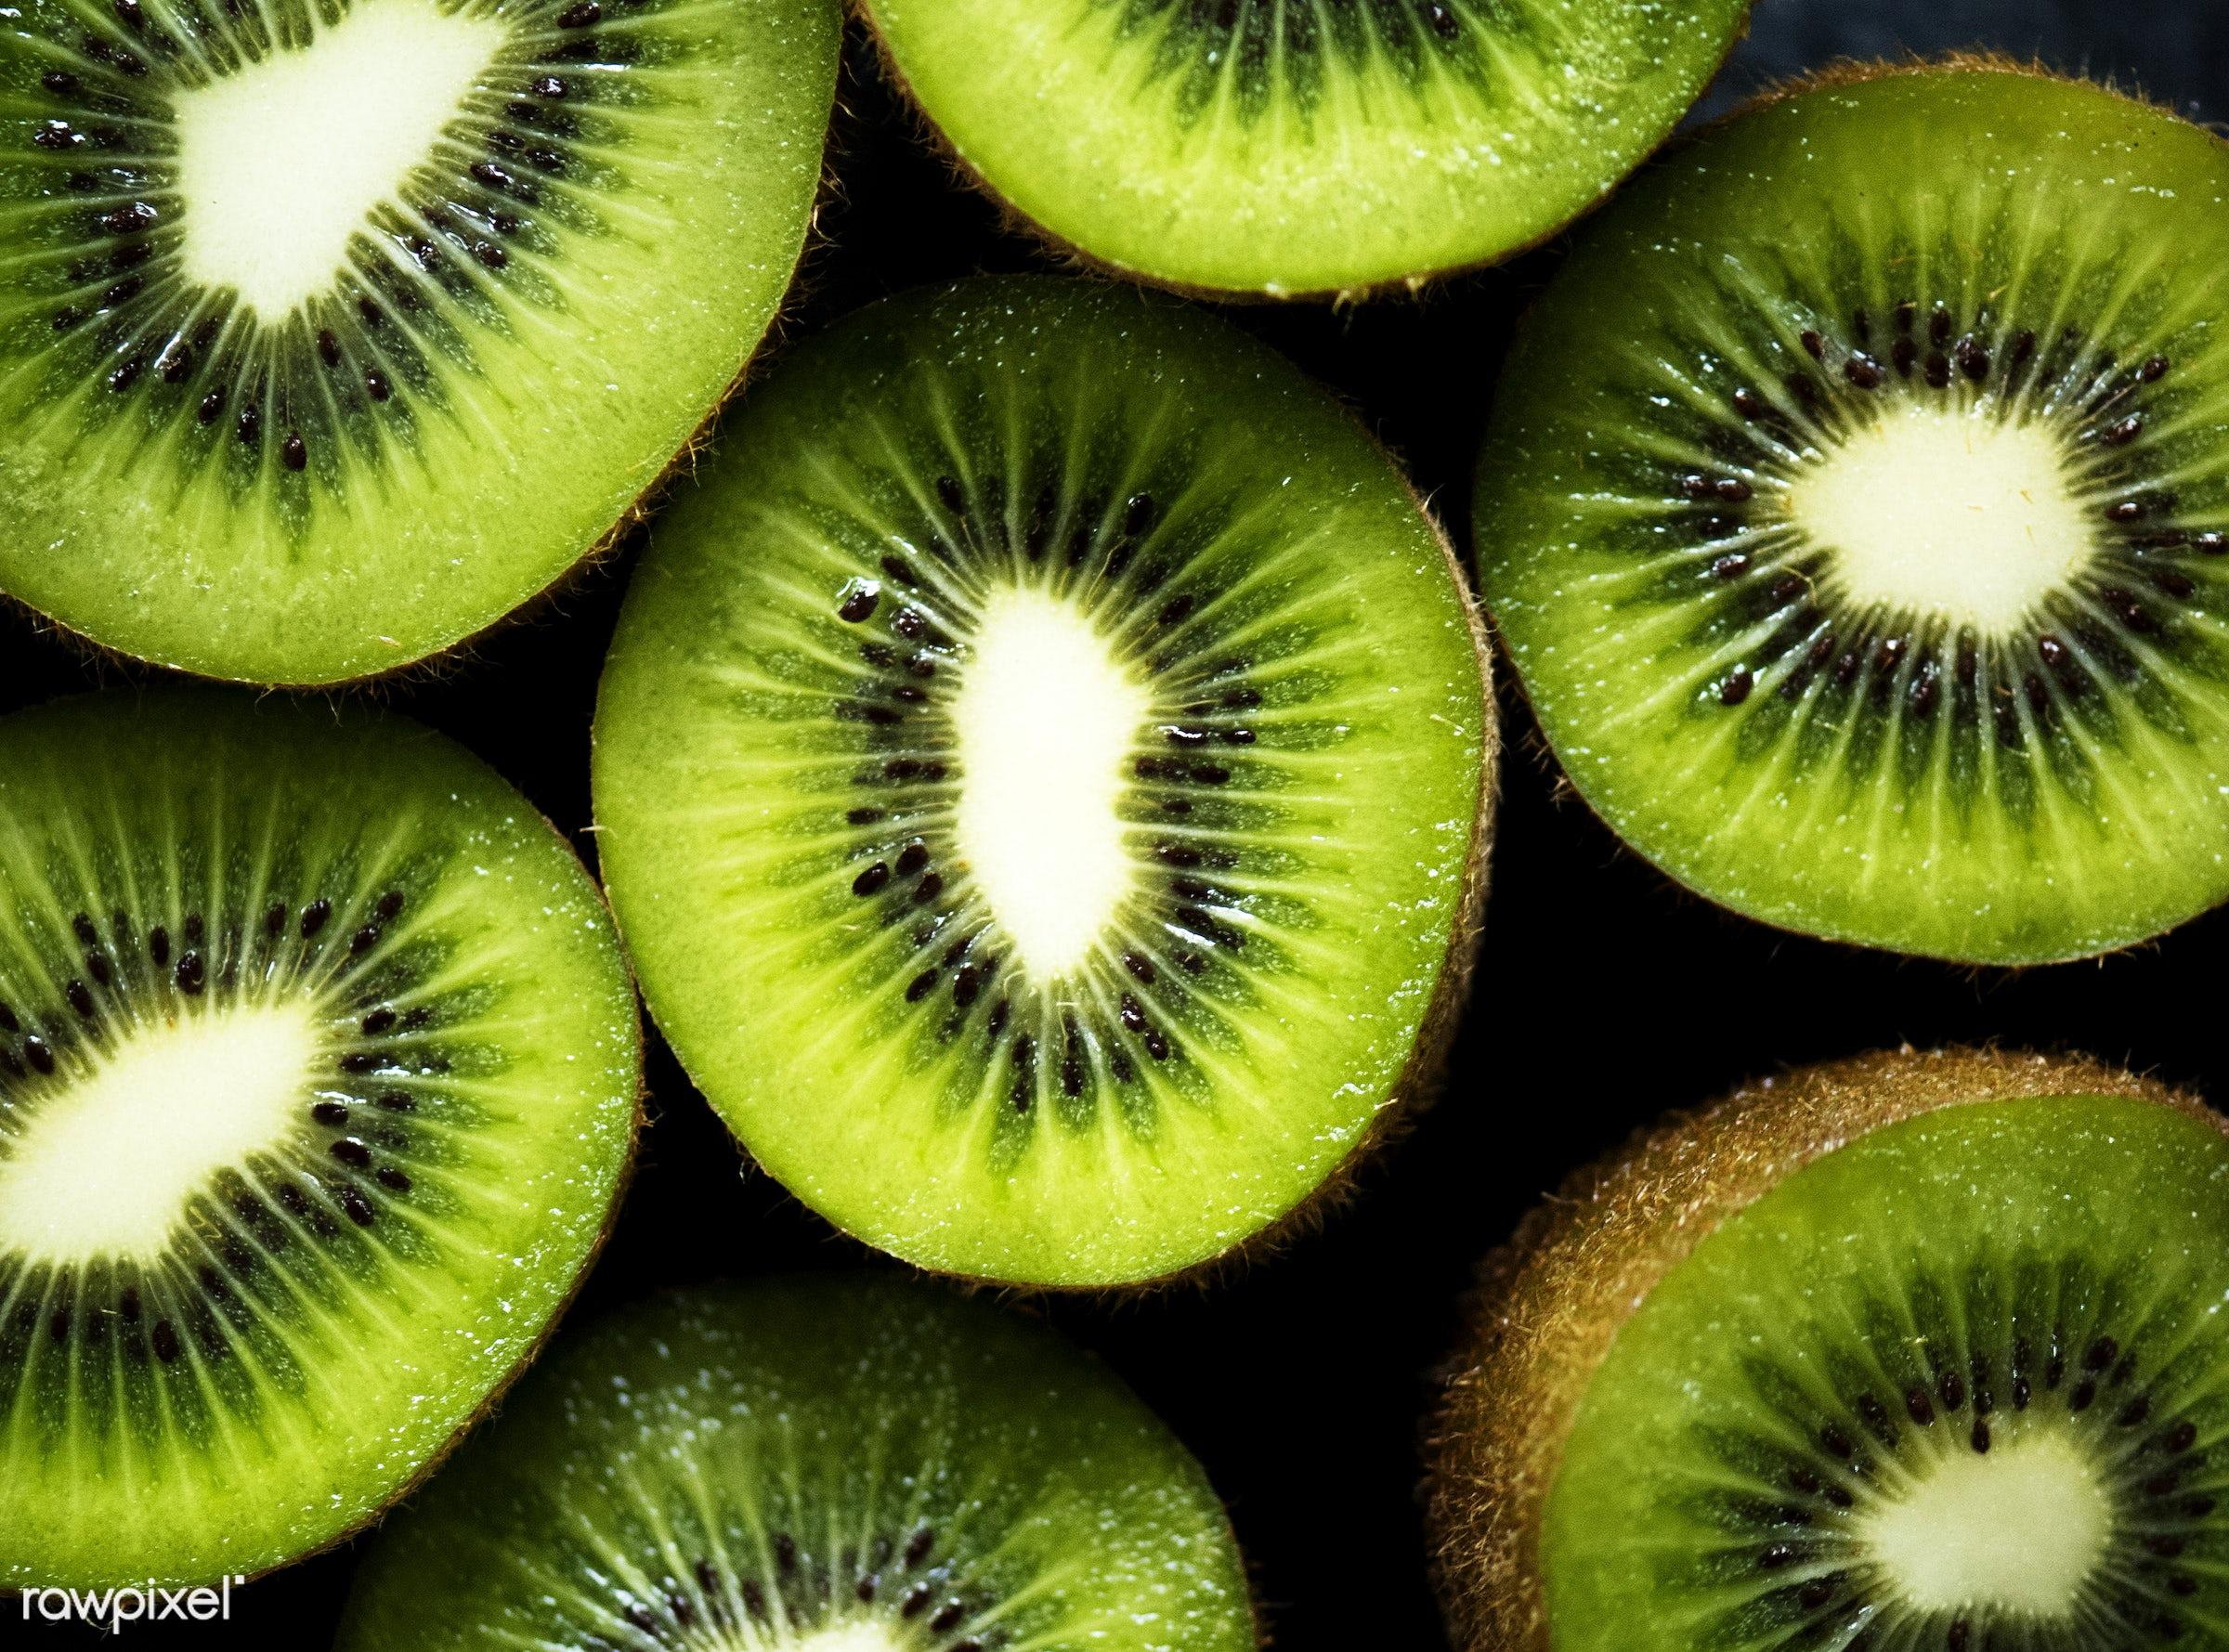 Fresh kiwi fruit - fruit, green, organic, fresh, kiwi, healthy, ingredient, closeup, products, nature, background, ripe